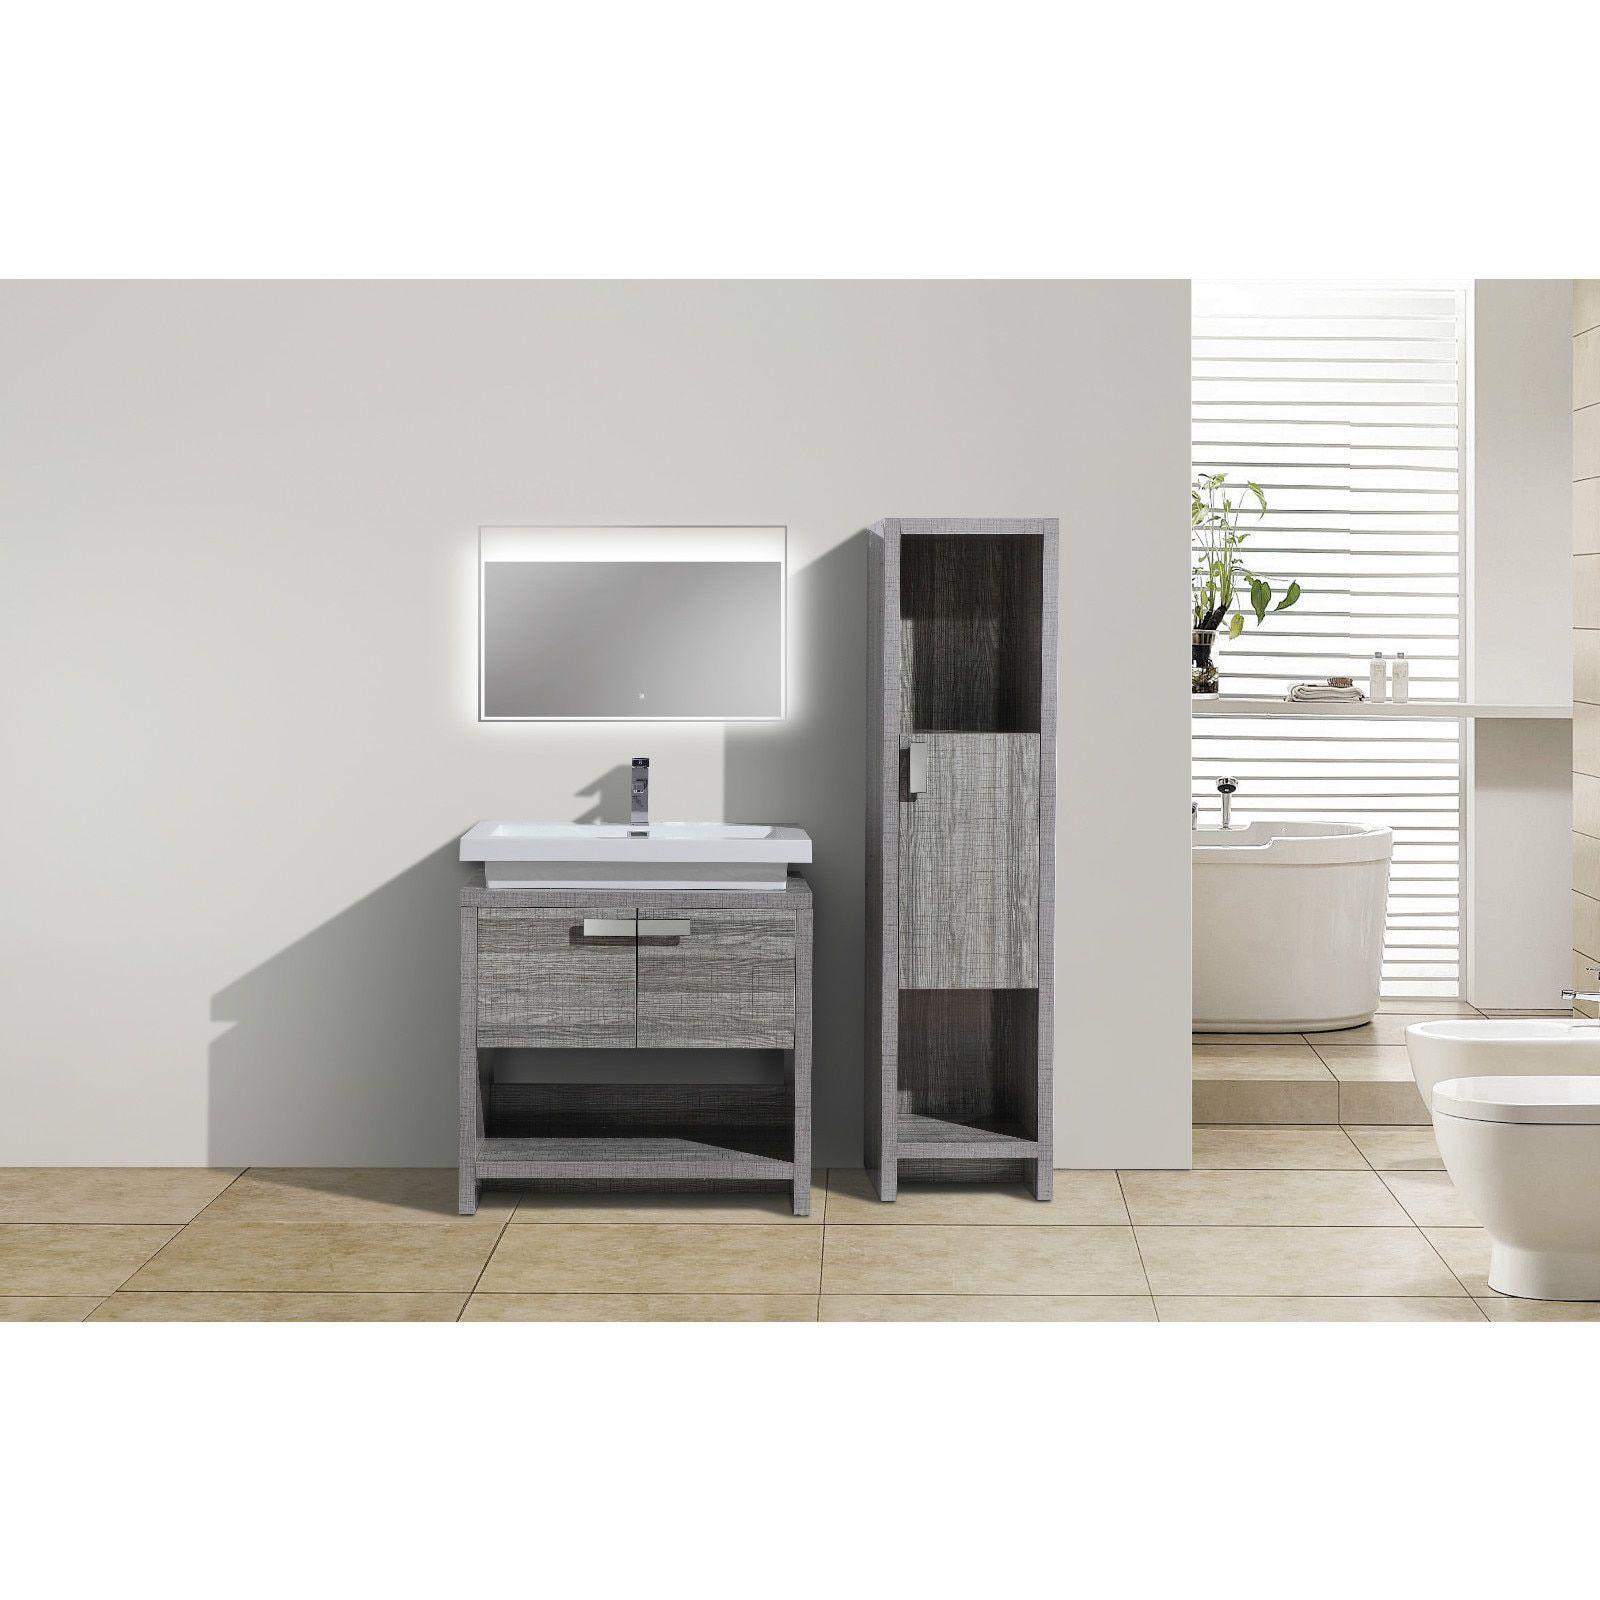 Moreno Bath Mol 32 Inch Free Standing Modern Bathroom Vanity With